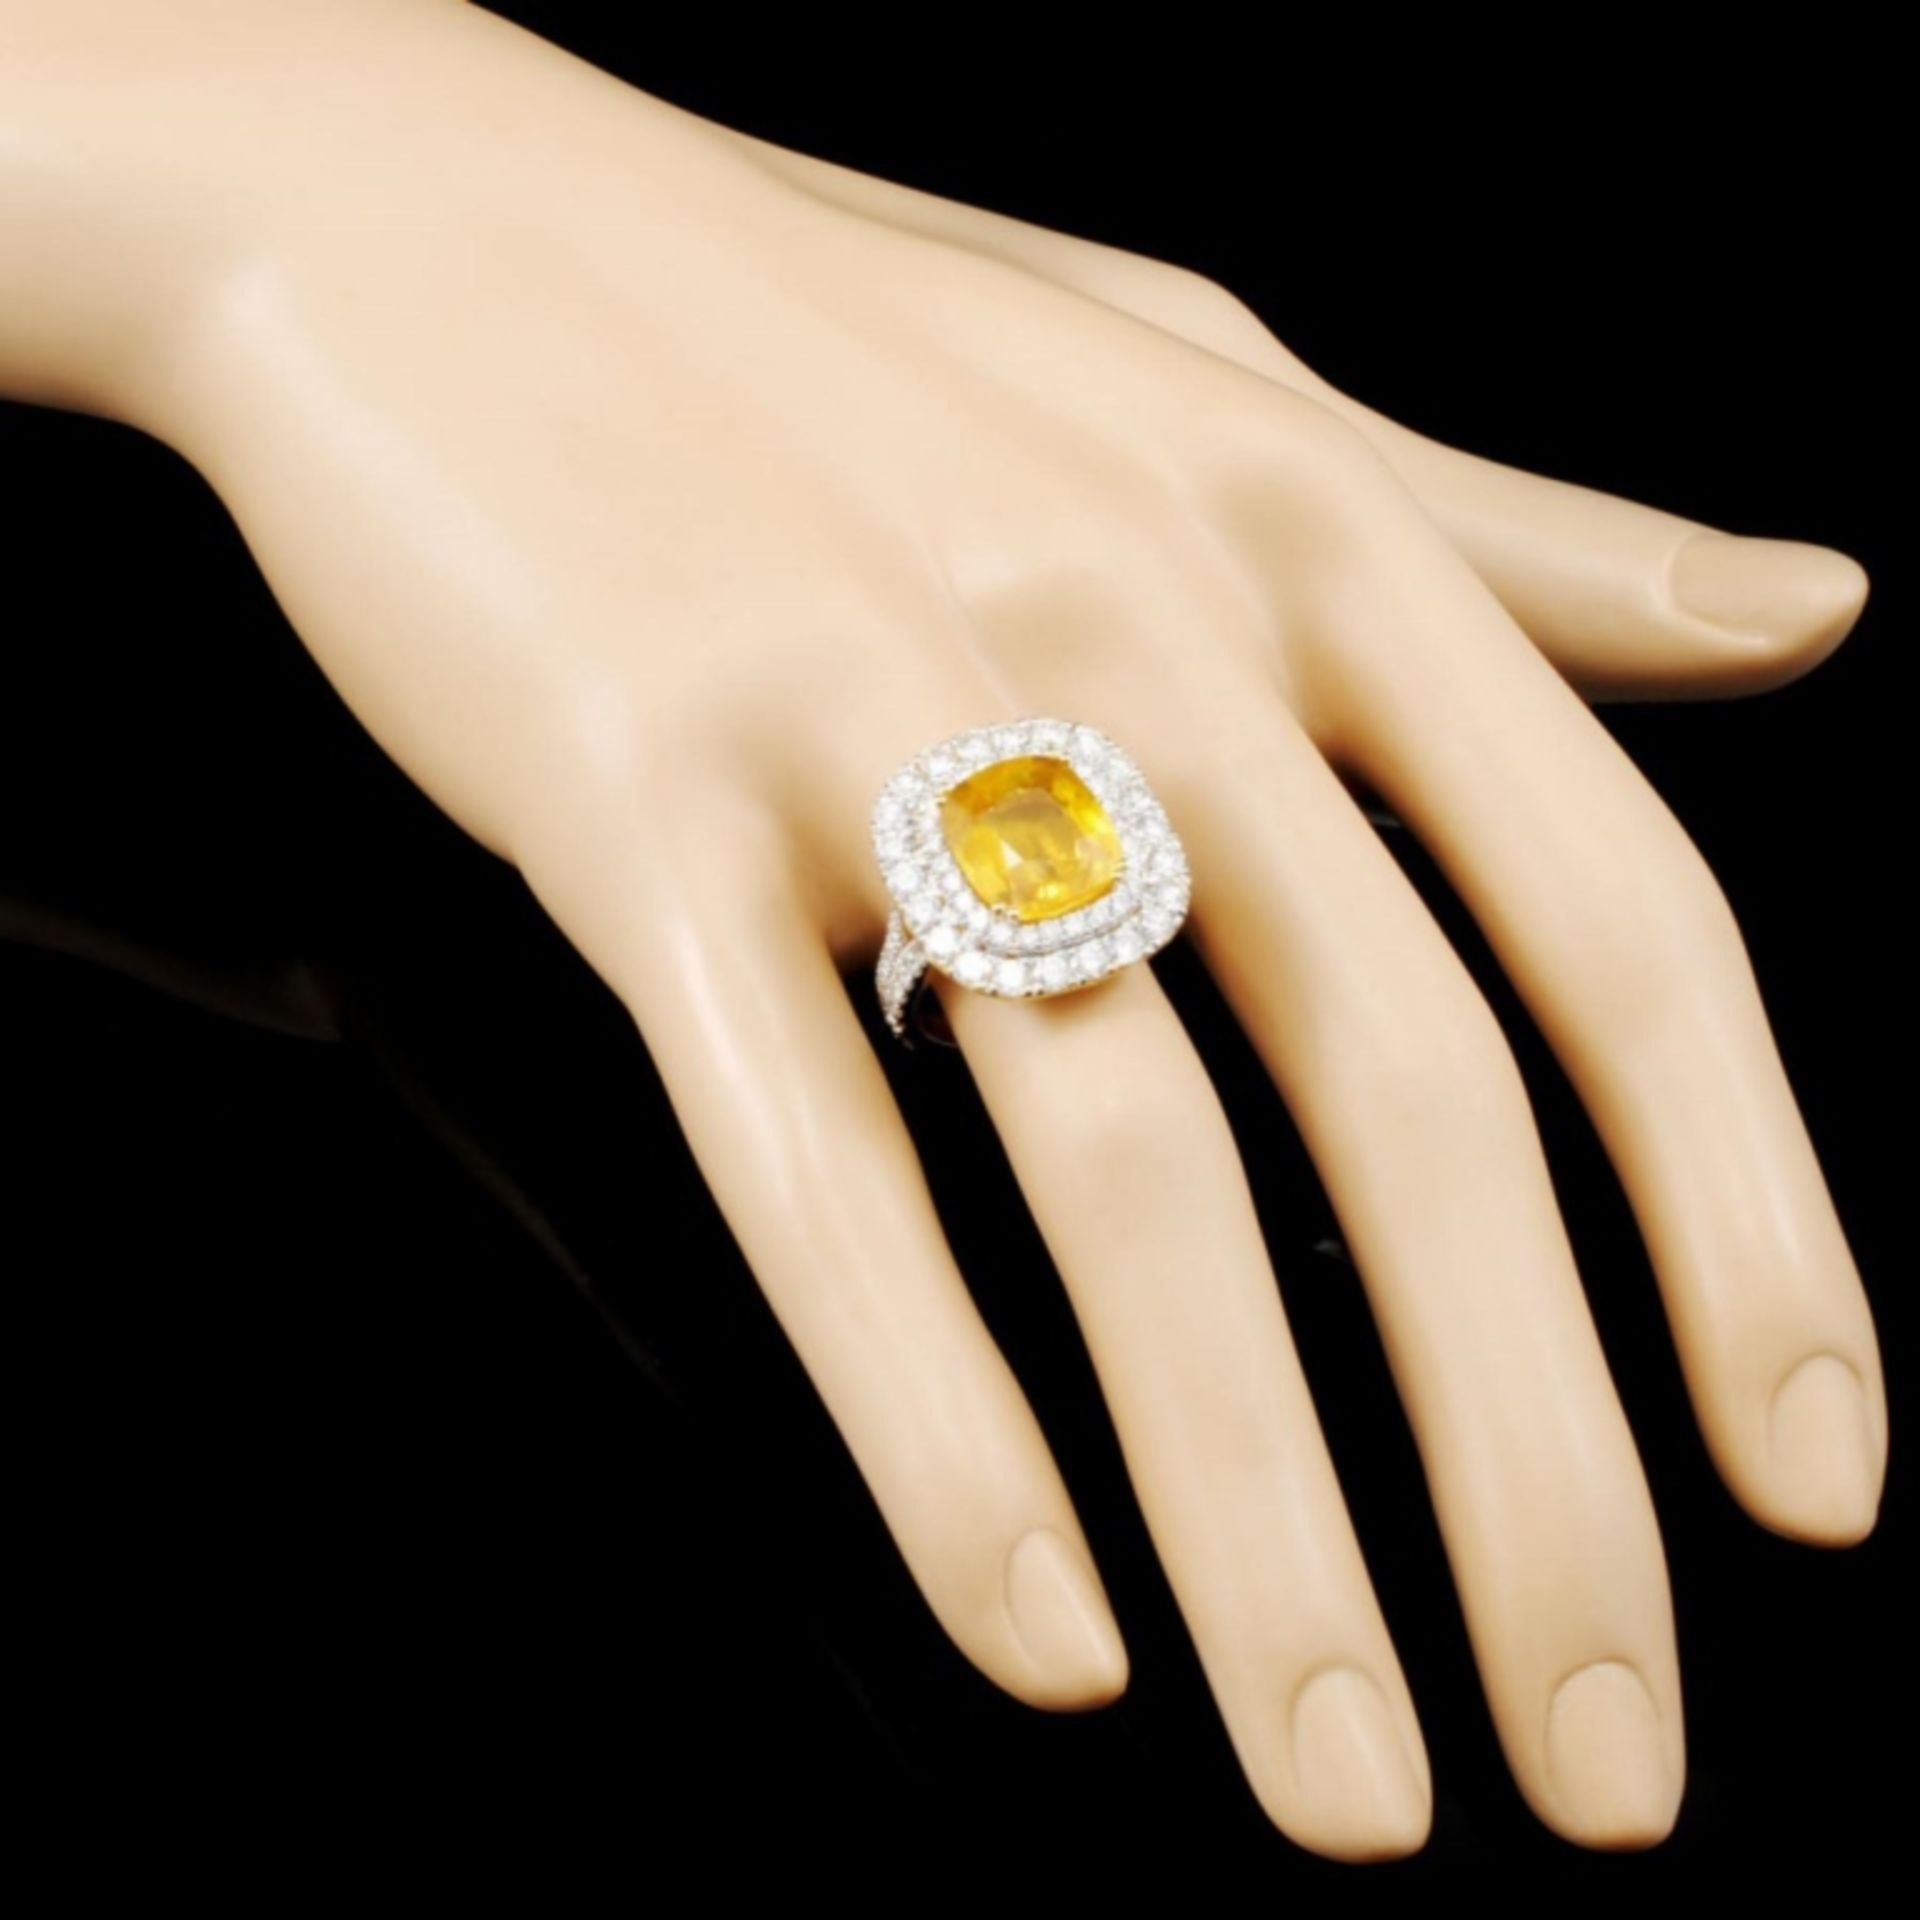 18K Gold 7.66ct Sapphire & 2.99ctw Diamond Ring - Image 3 of 5